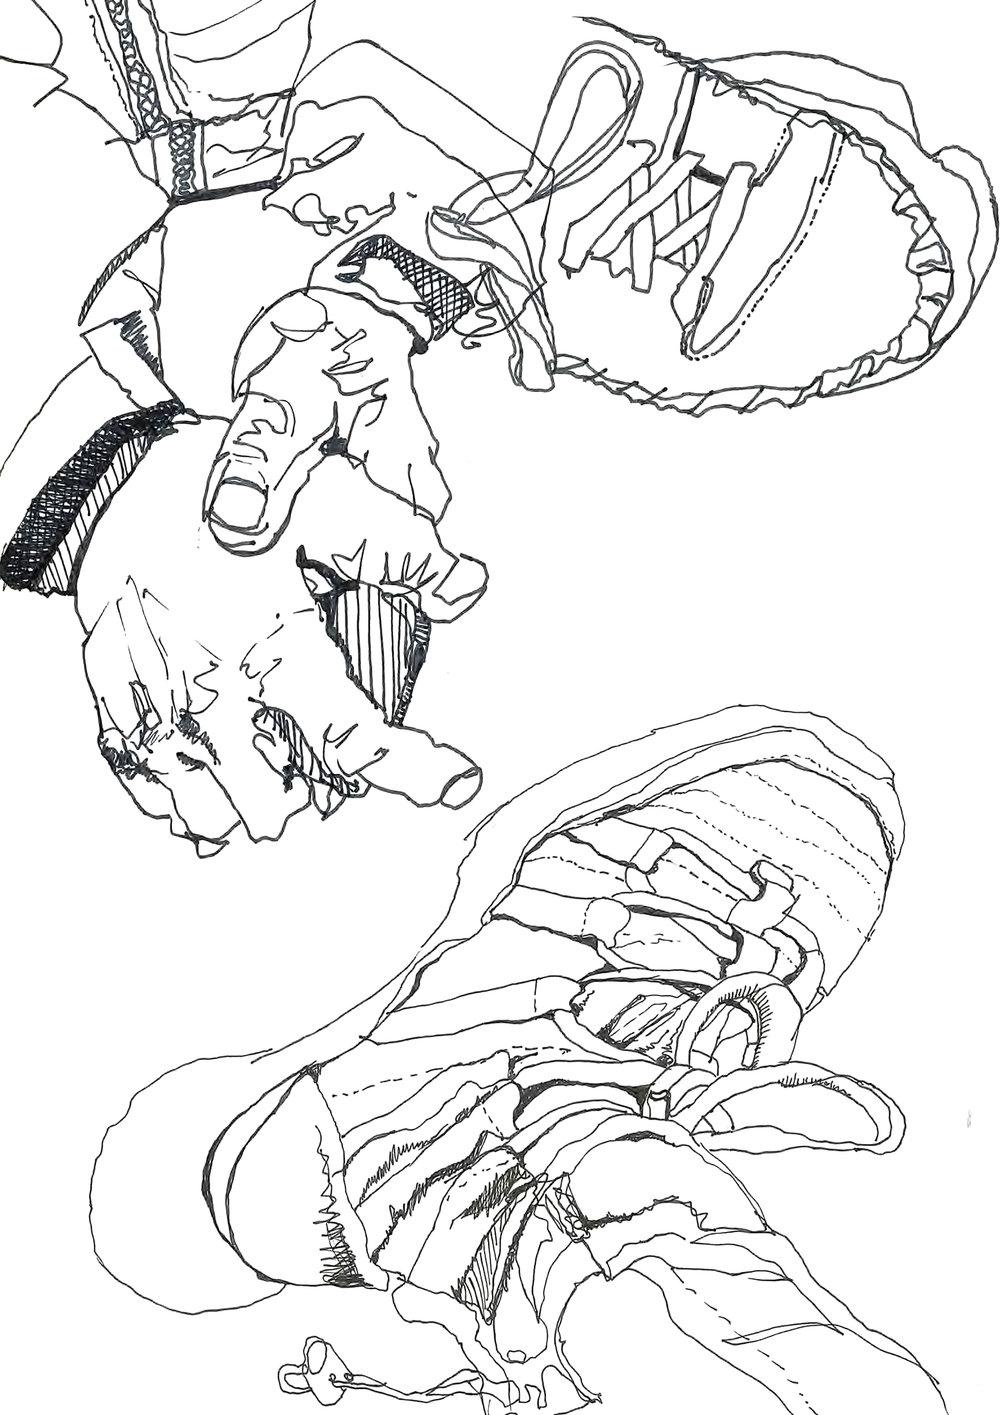 Whiten_shoes_drawing_illustration.jpg